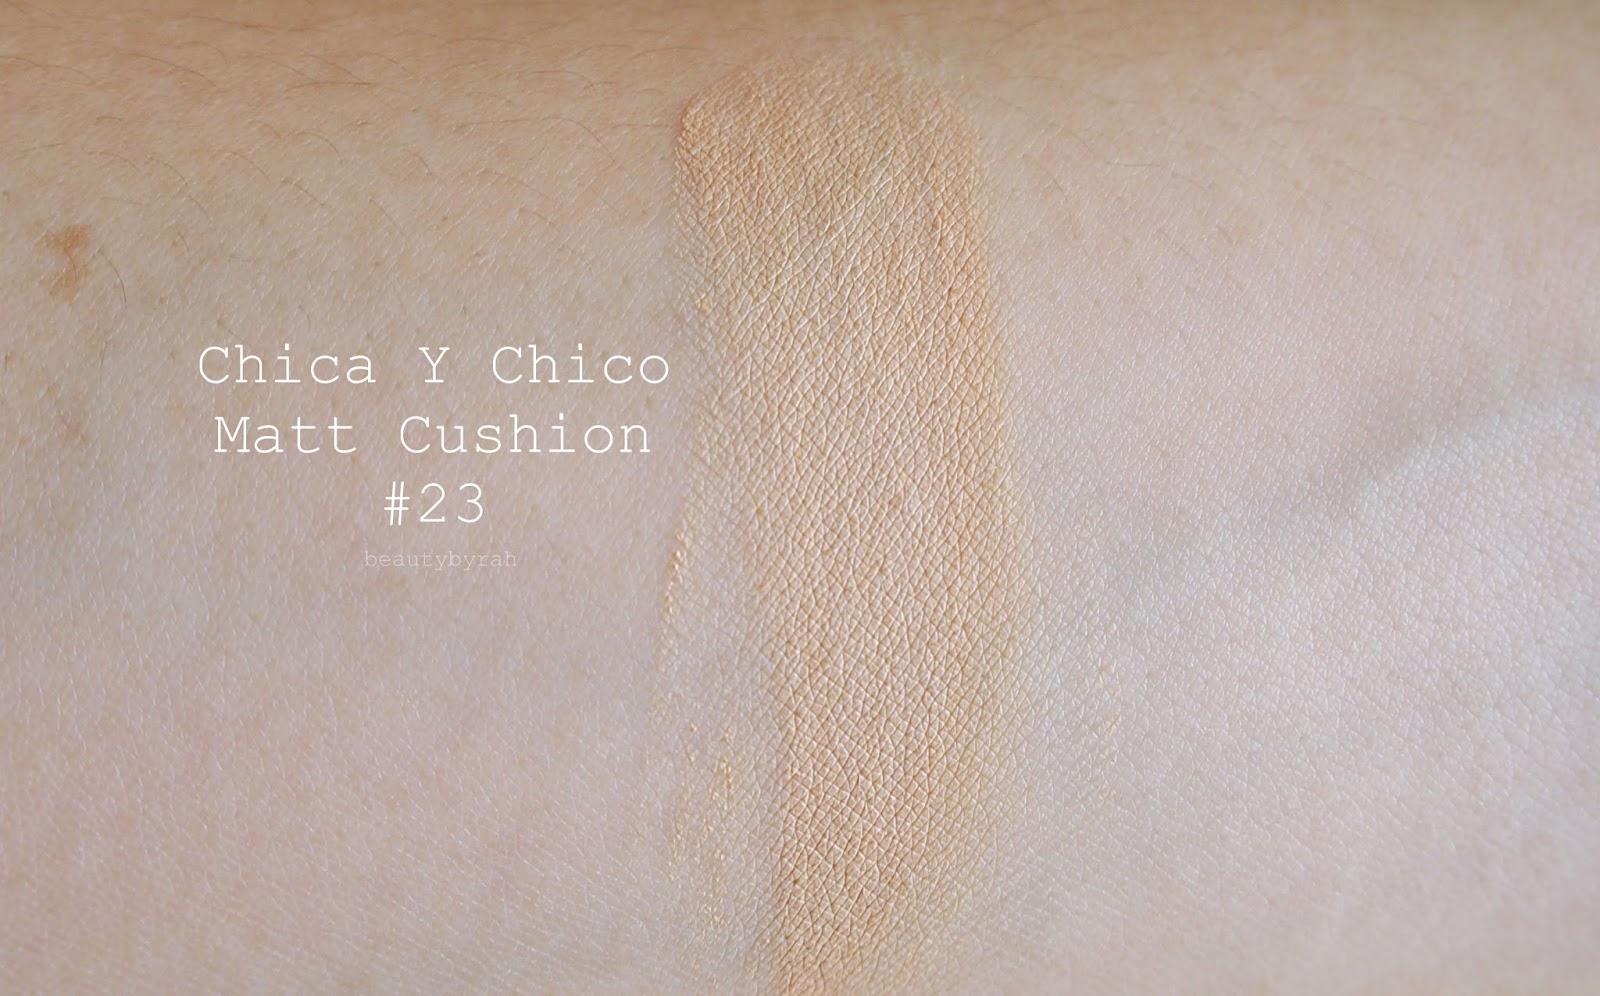 Chica Y Chico Matt Cushion Review